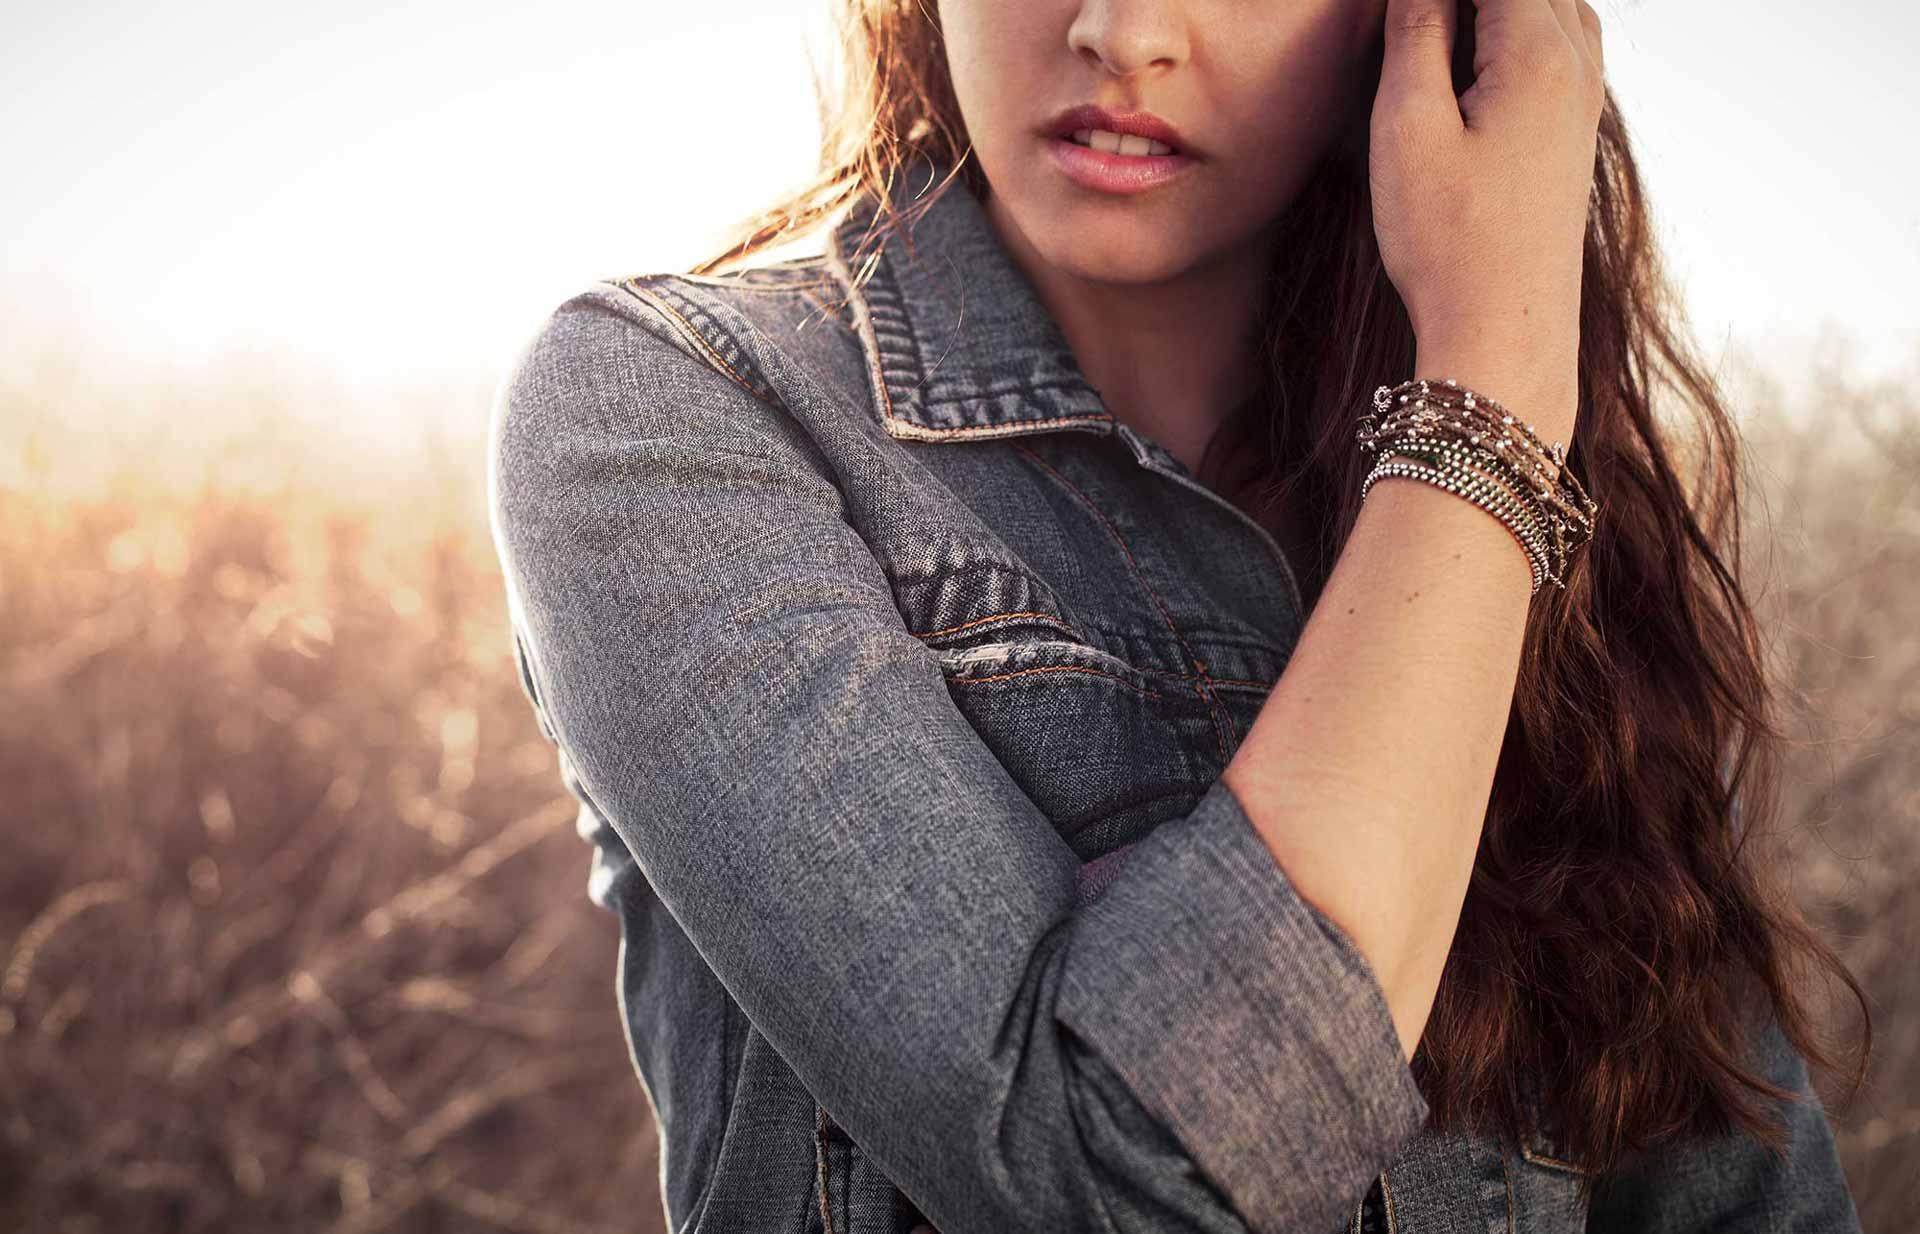 Modell med Wakami-armband. Foto: Garret Byrum